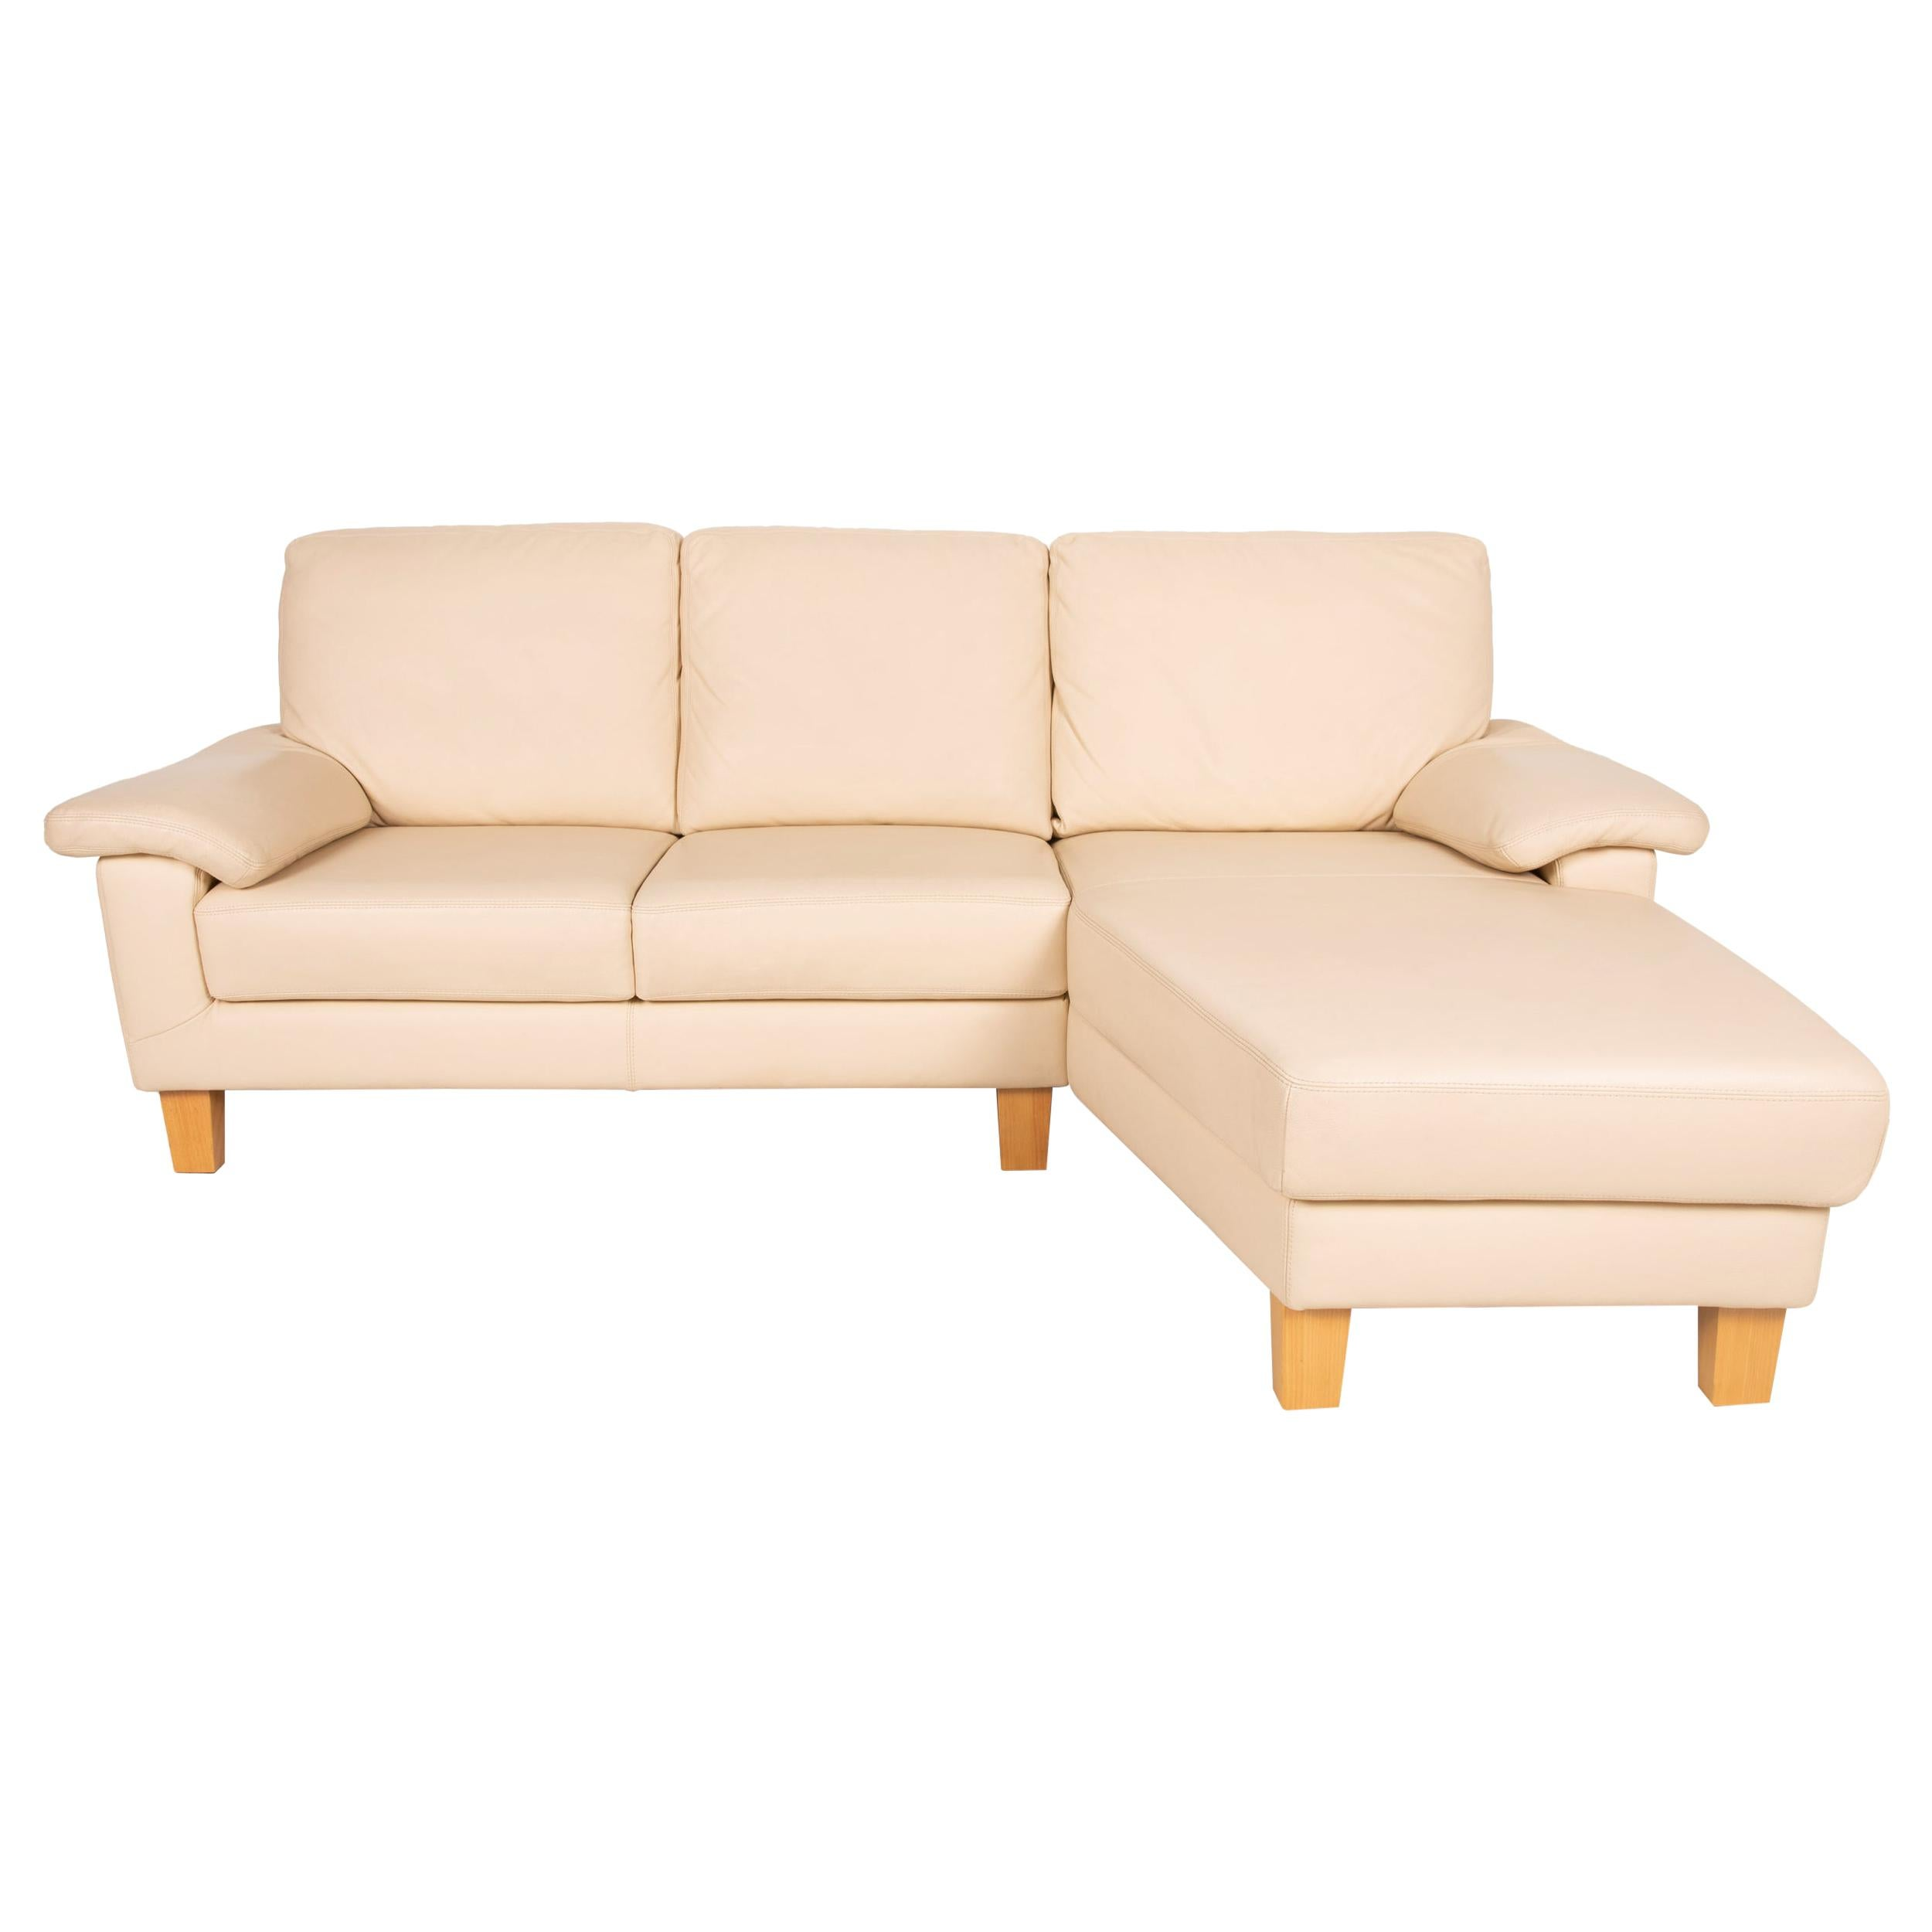 Willi Schillig Leather Sofa Cream Corner Sofa Couch